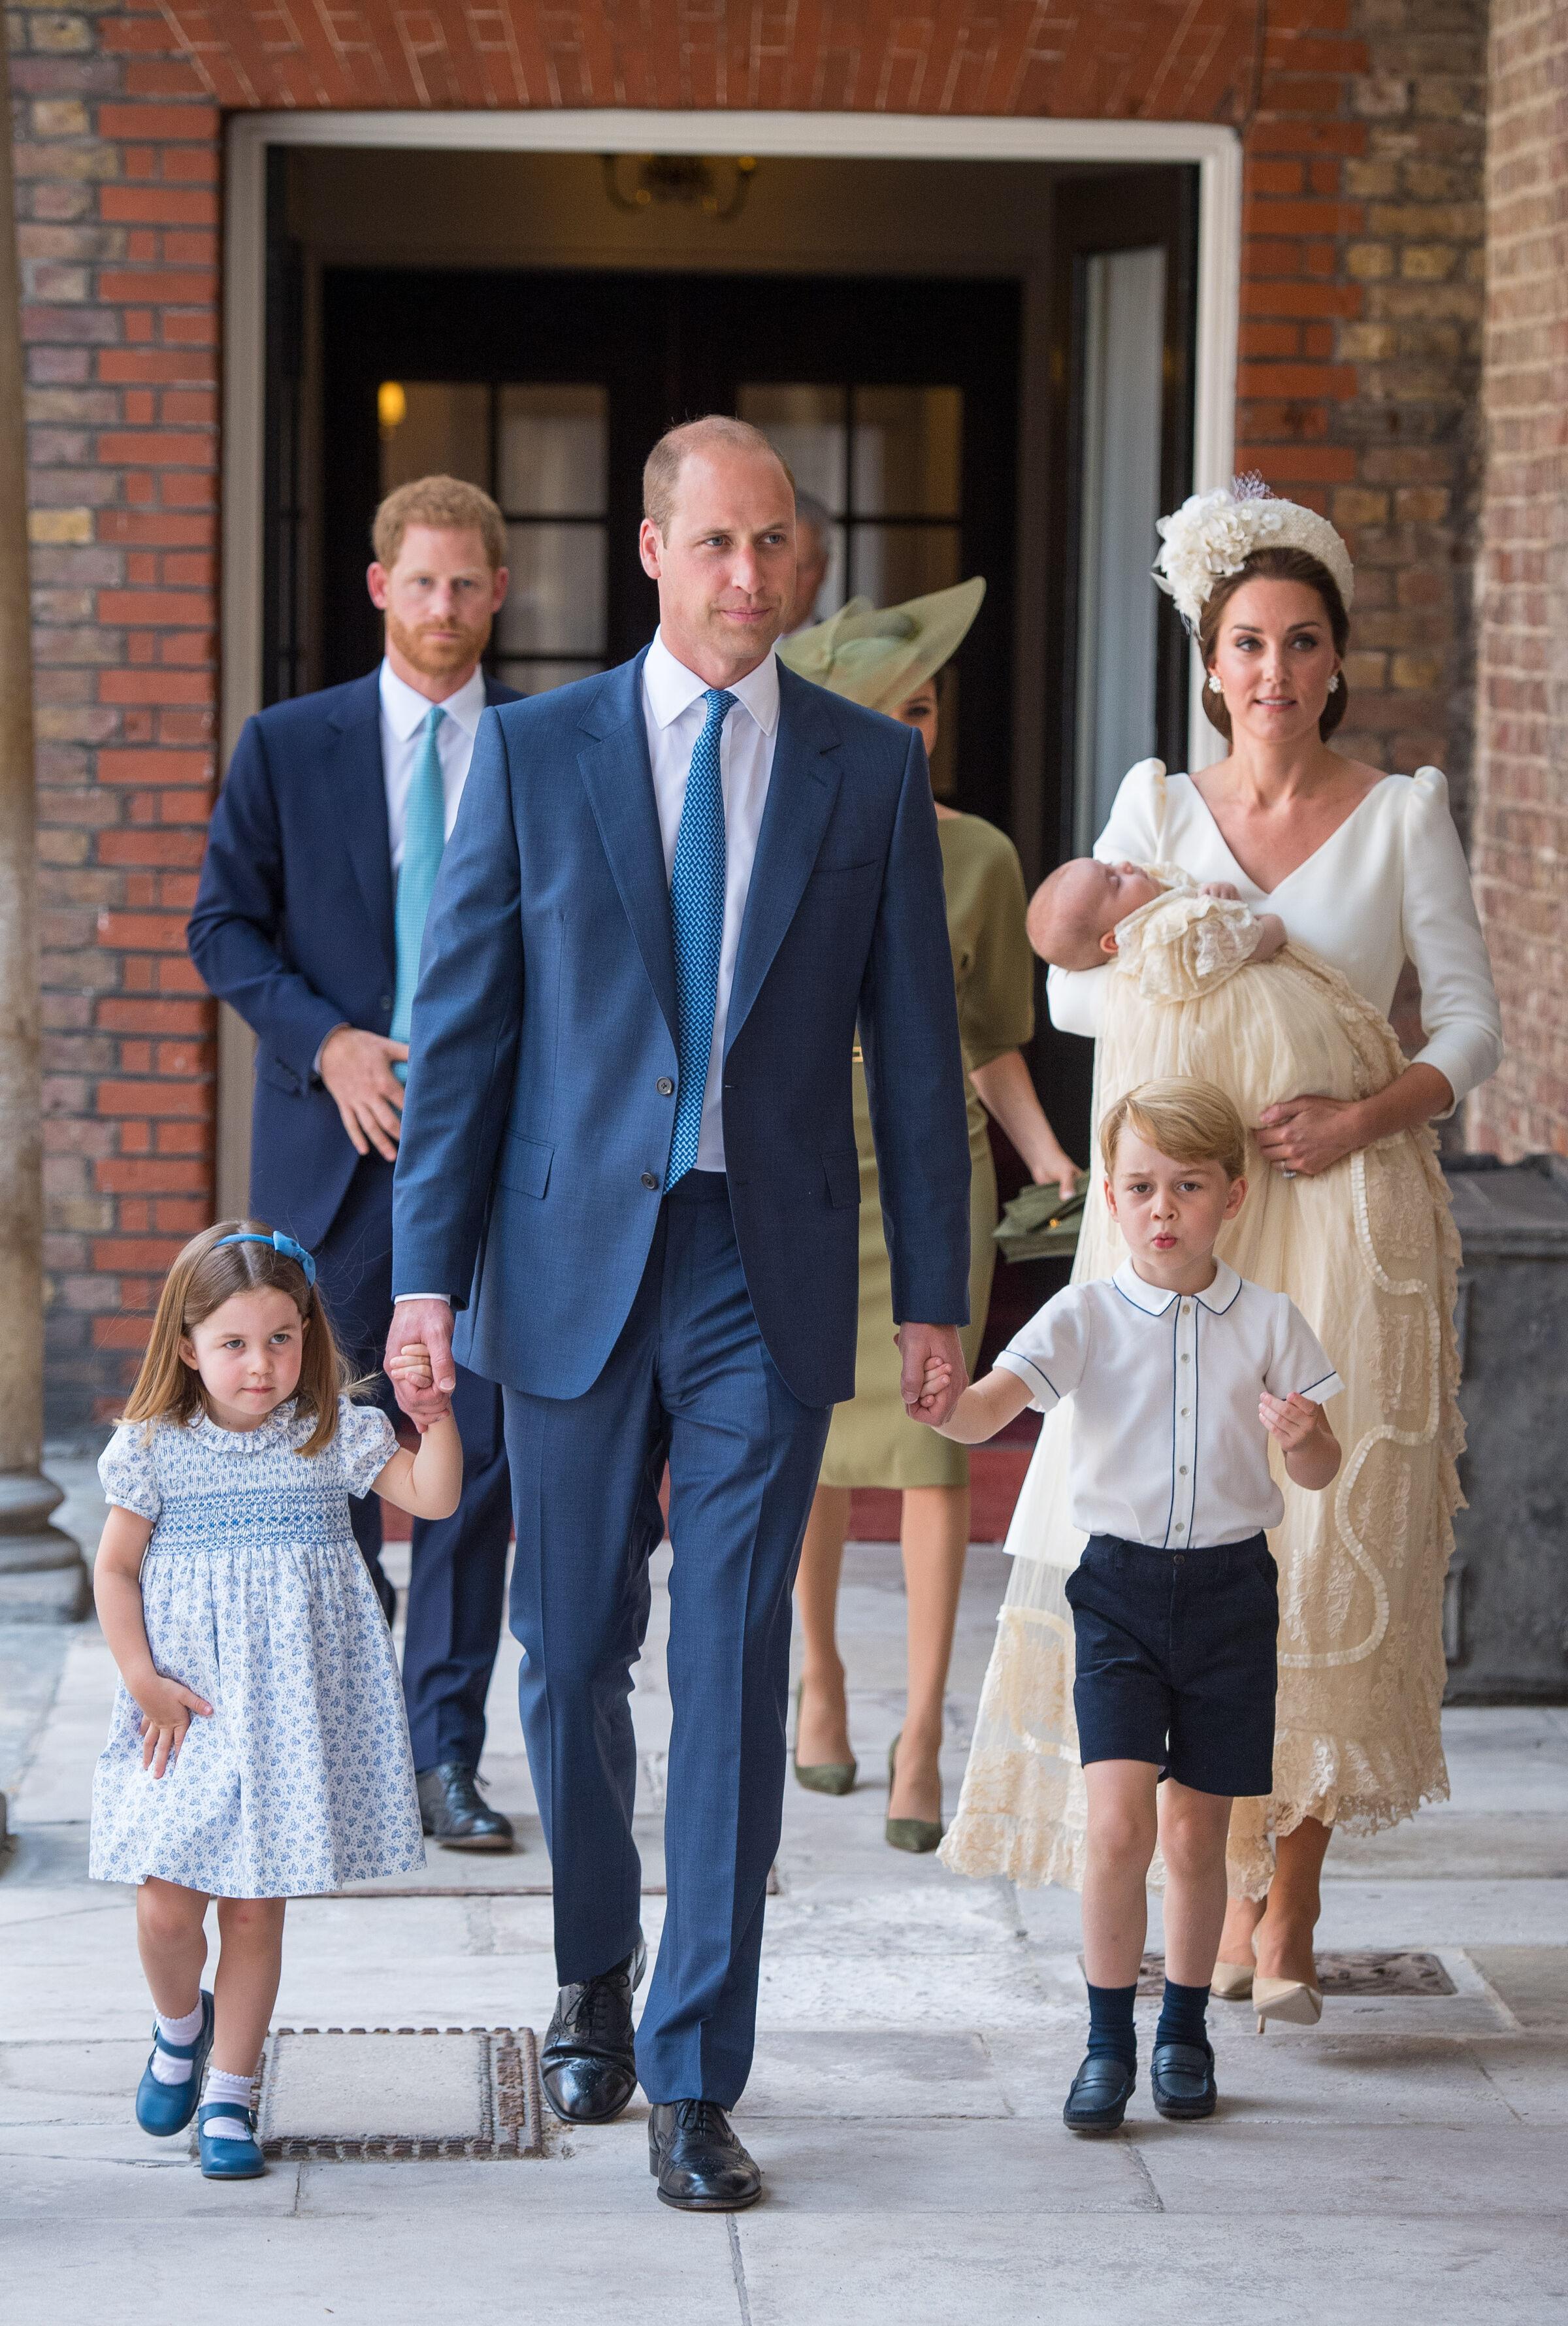 Batizado do Príncipe Louis: veja as primeiras fotos